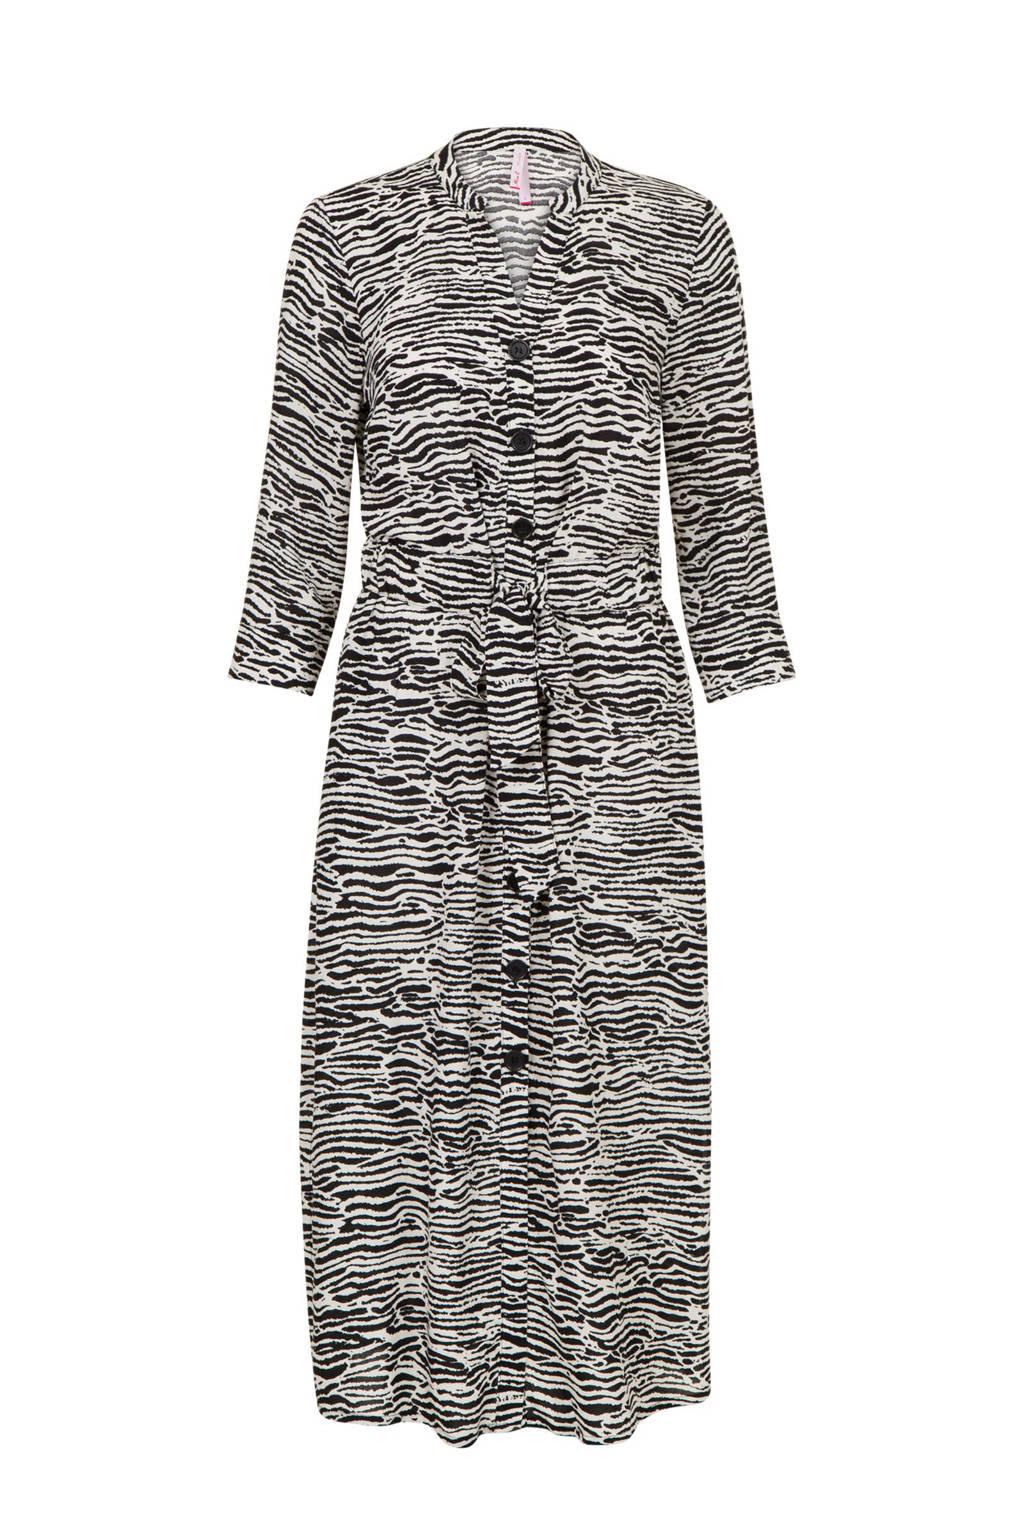 Miss Etam Regulier jurk met all over print, Wit